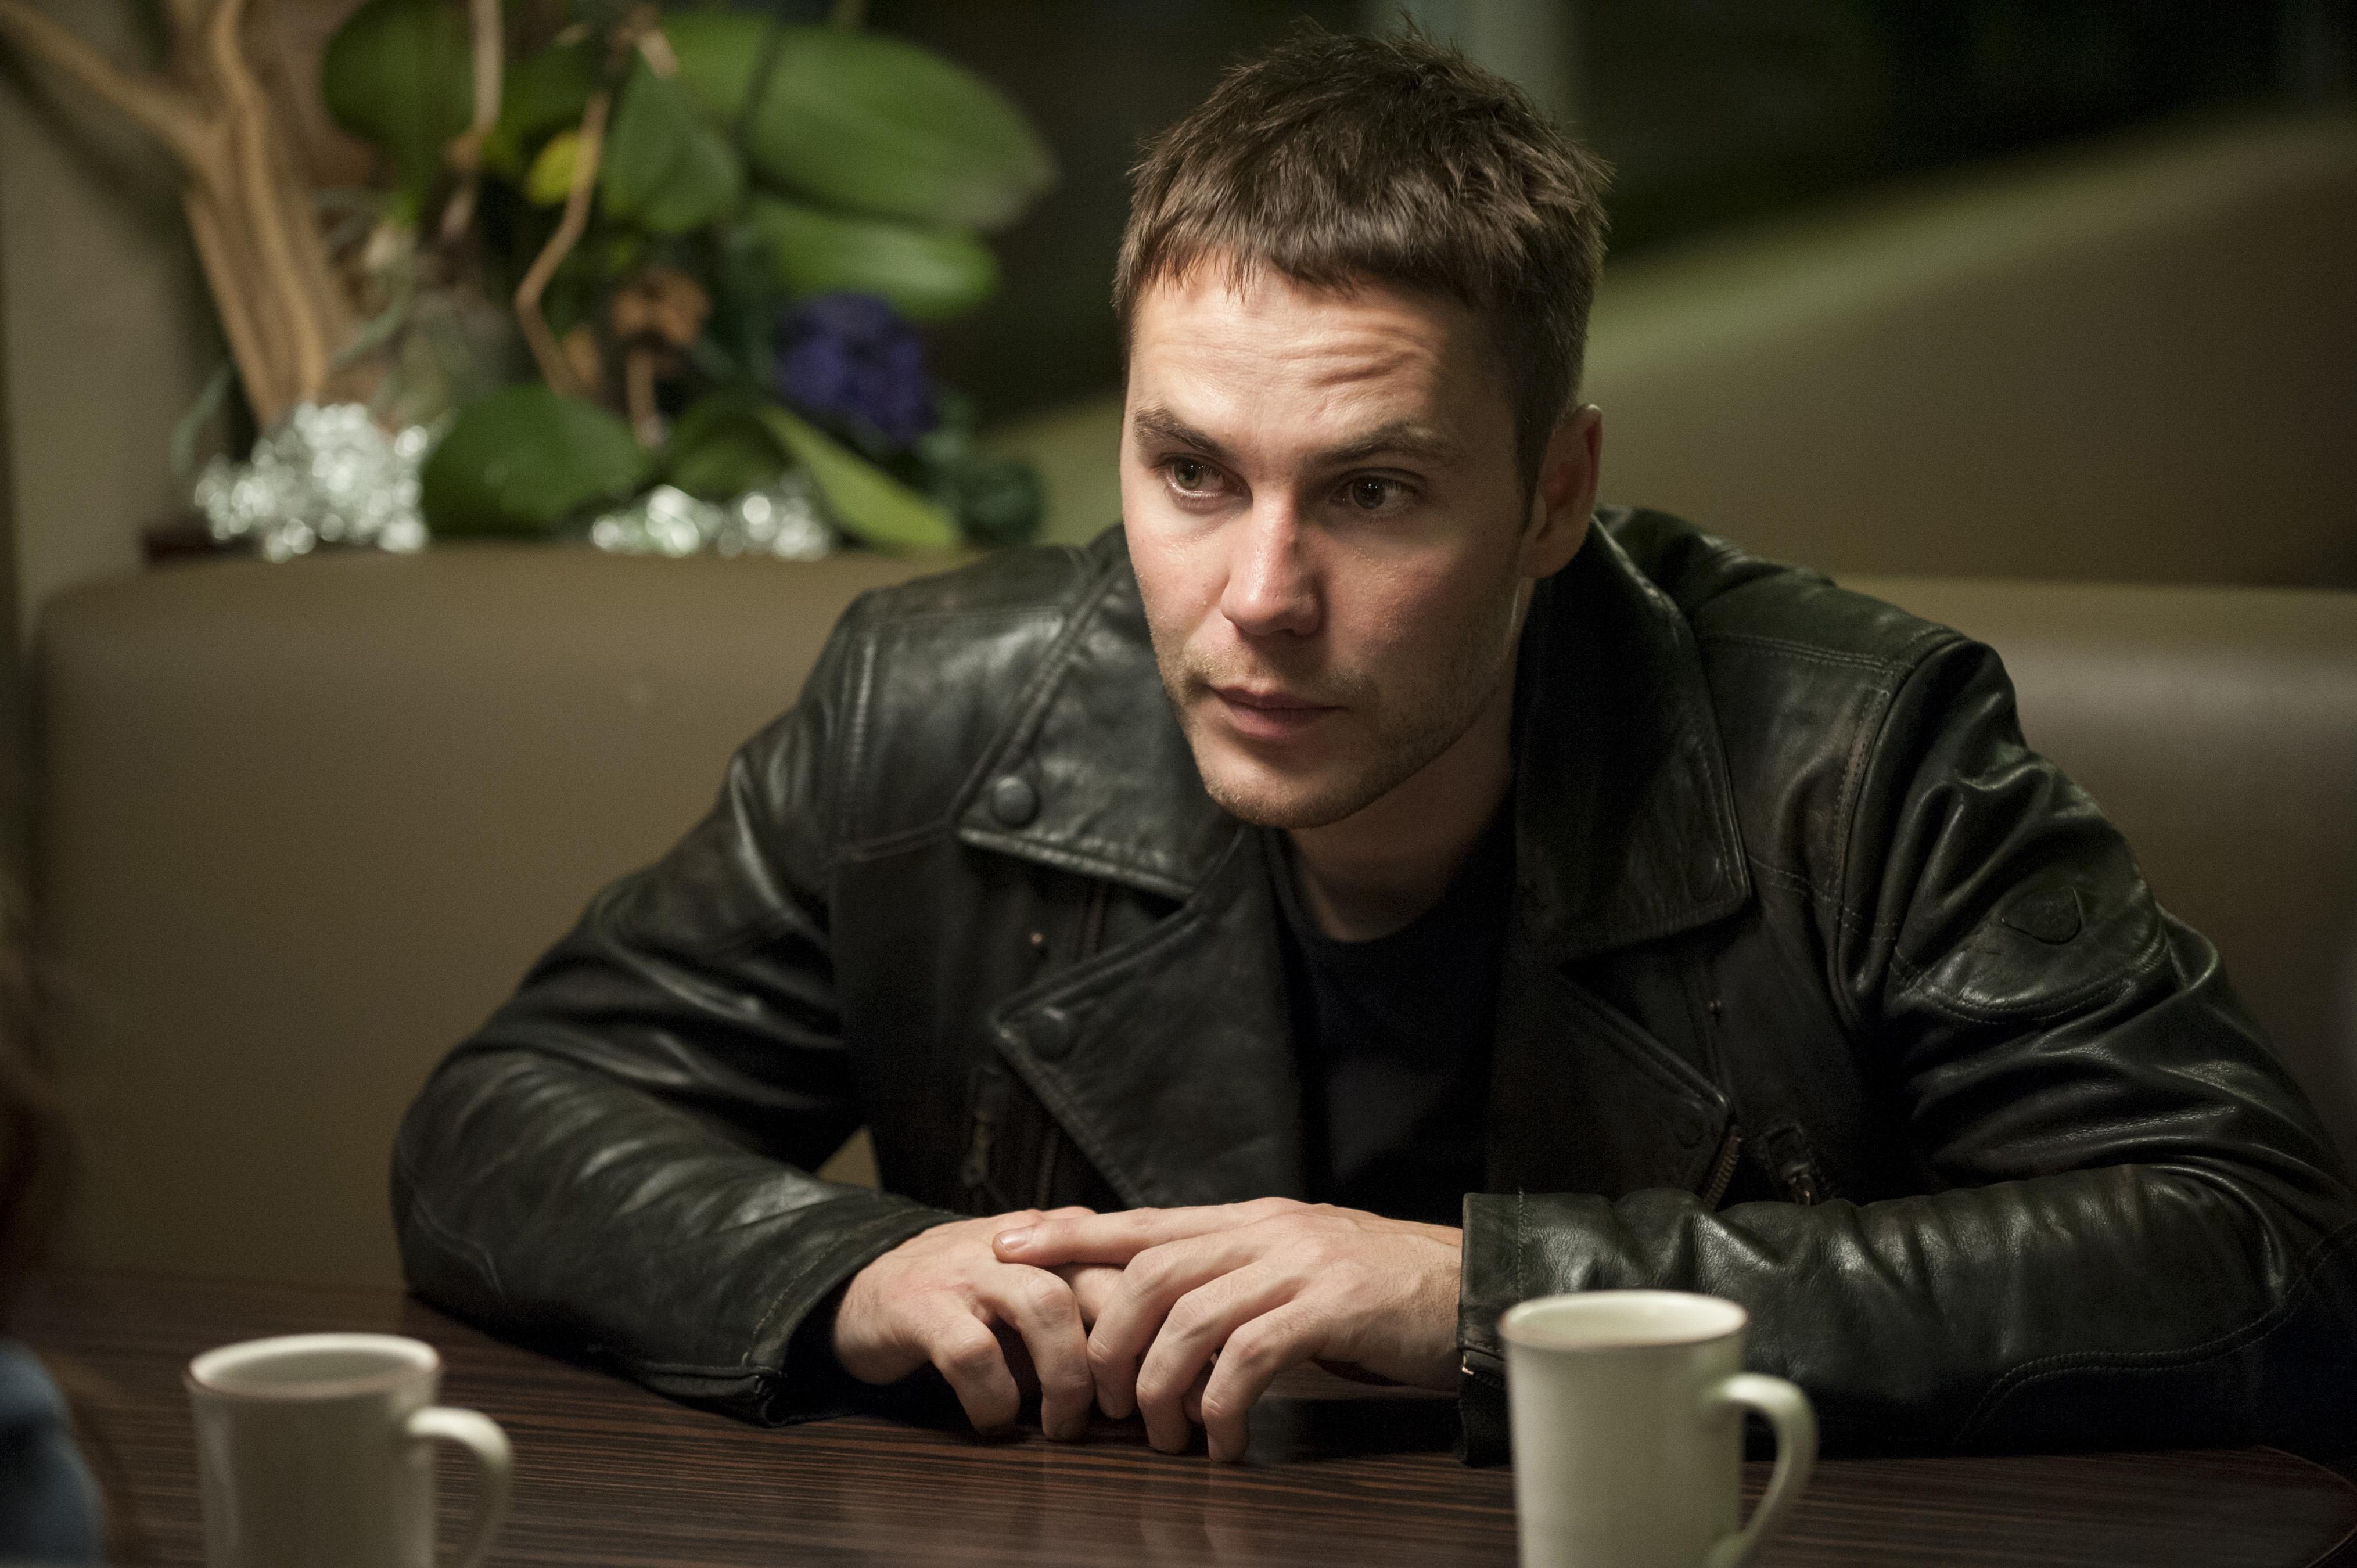 True Detective (TV Series 2014– ) - Photo Gallery - IMDb